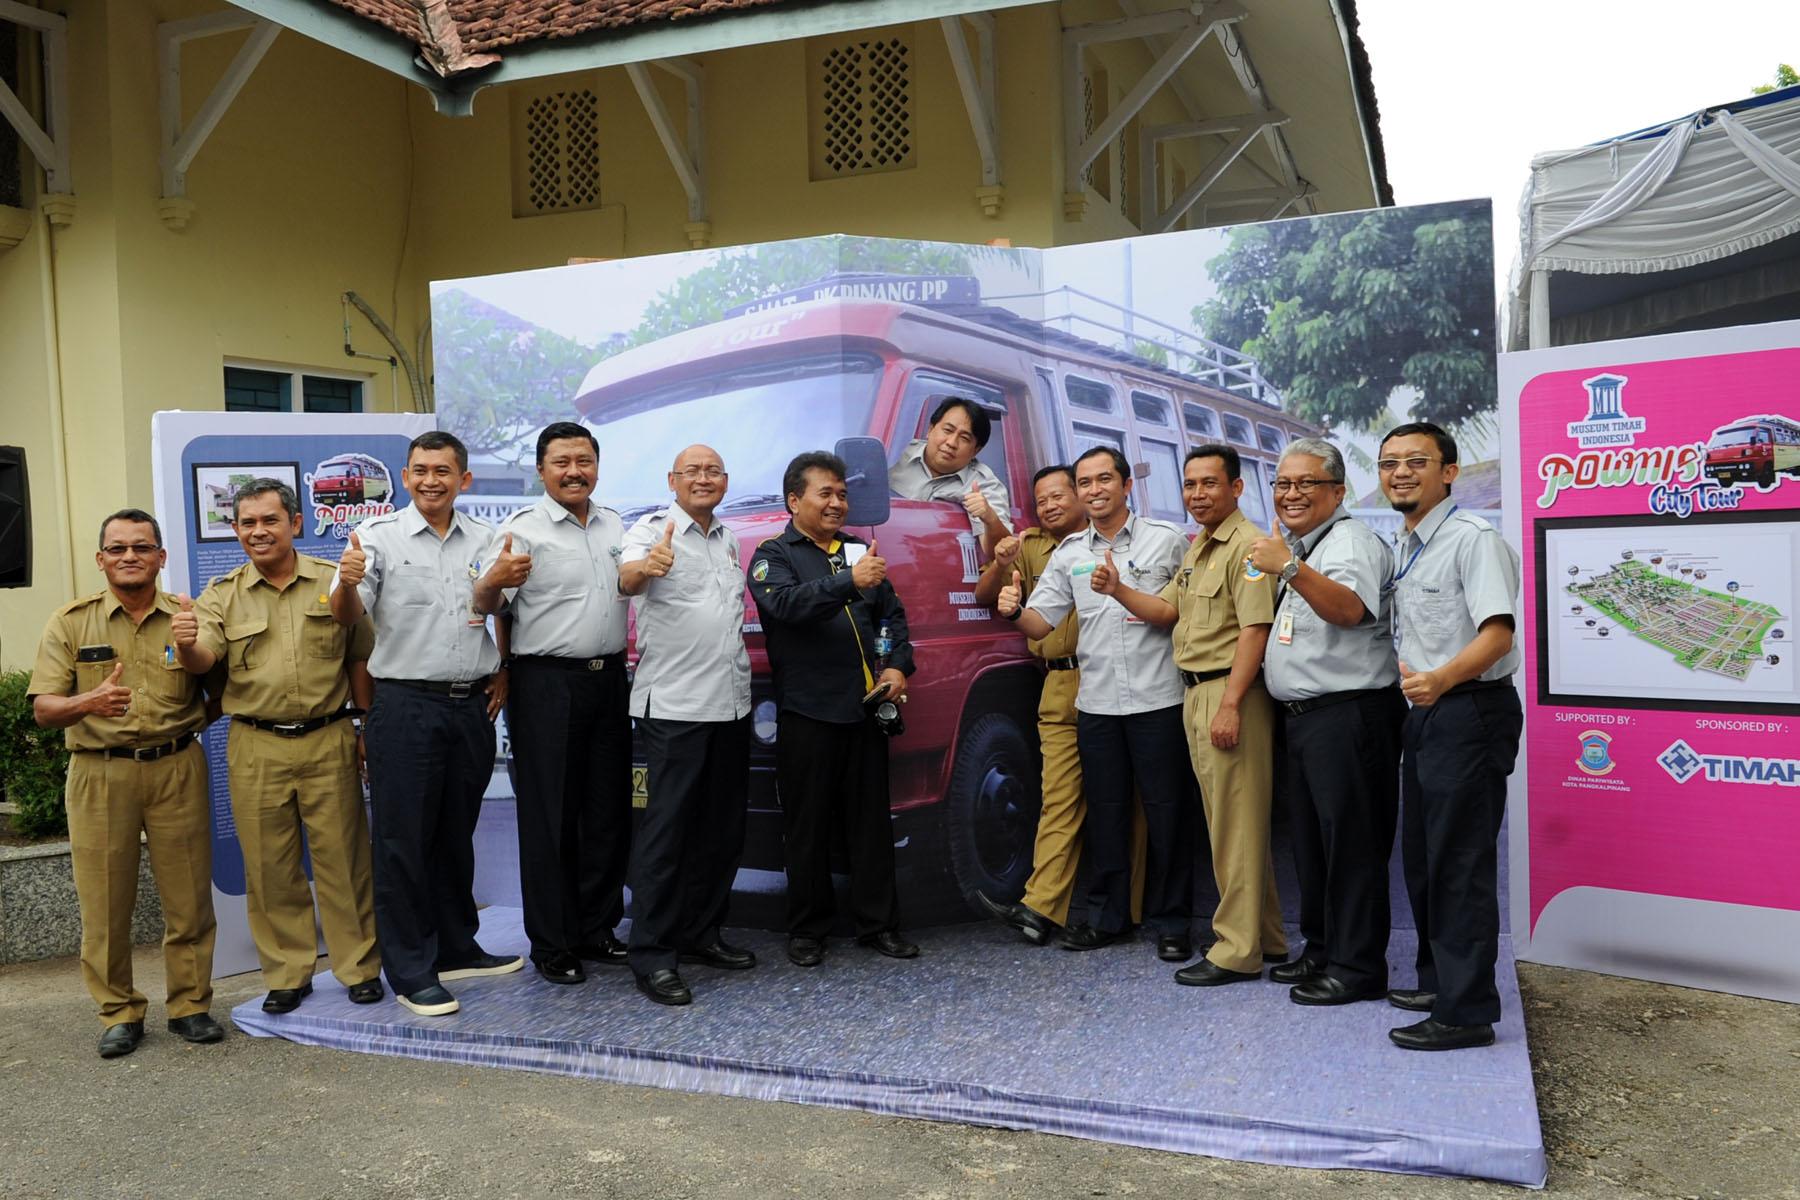 Kementerian Bumn Sebagai Bentuk Dukungan Pariwisata Edutaiment Masyarakat Bangka Belitung